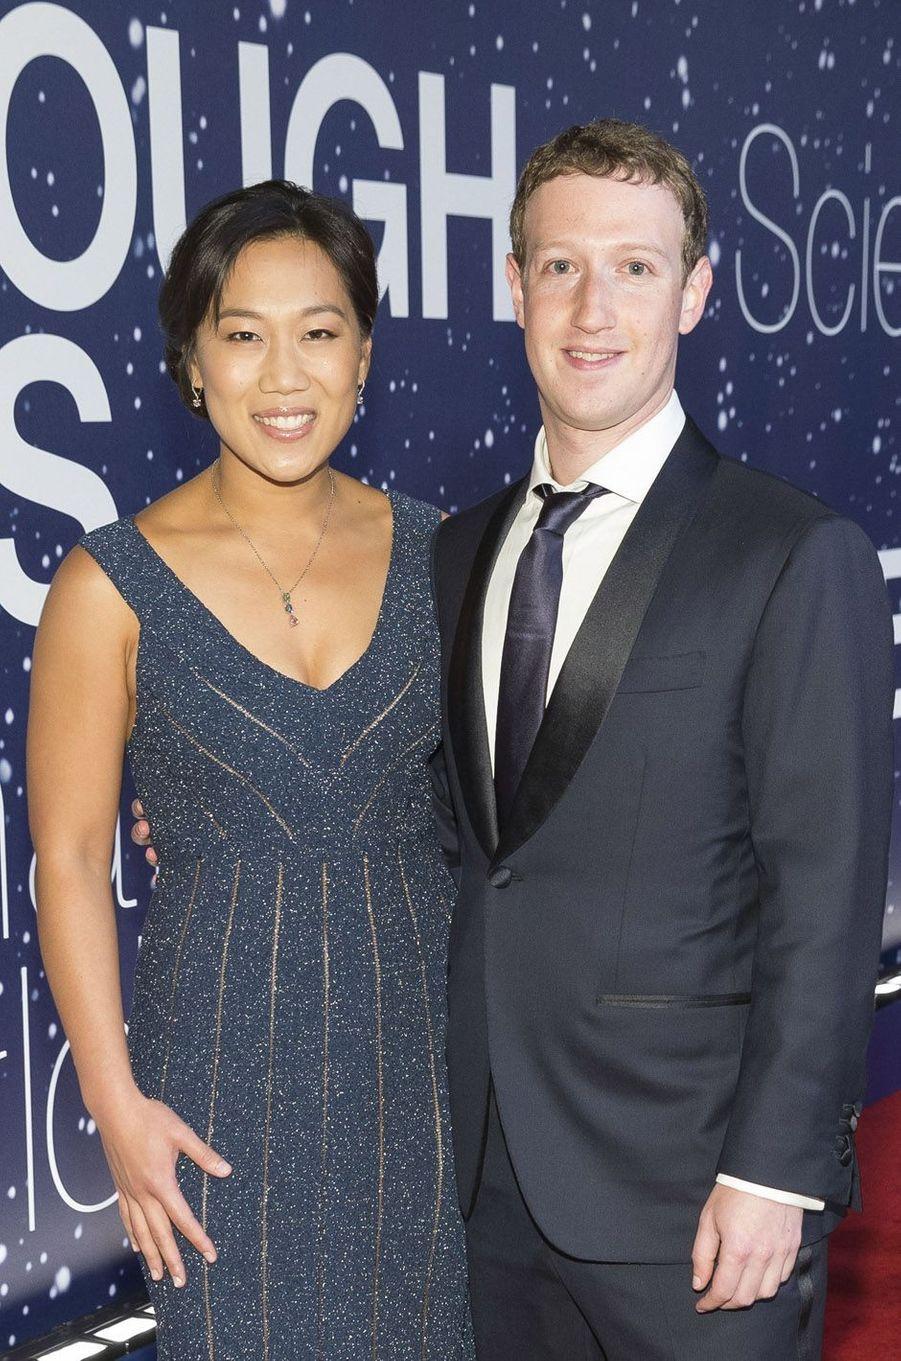 Mark Zuckerberg et Priscilla Chan ont accueilli la petite August en août 2017.